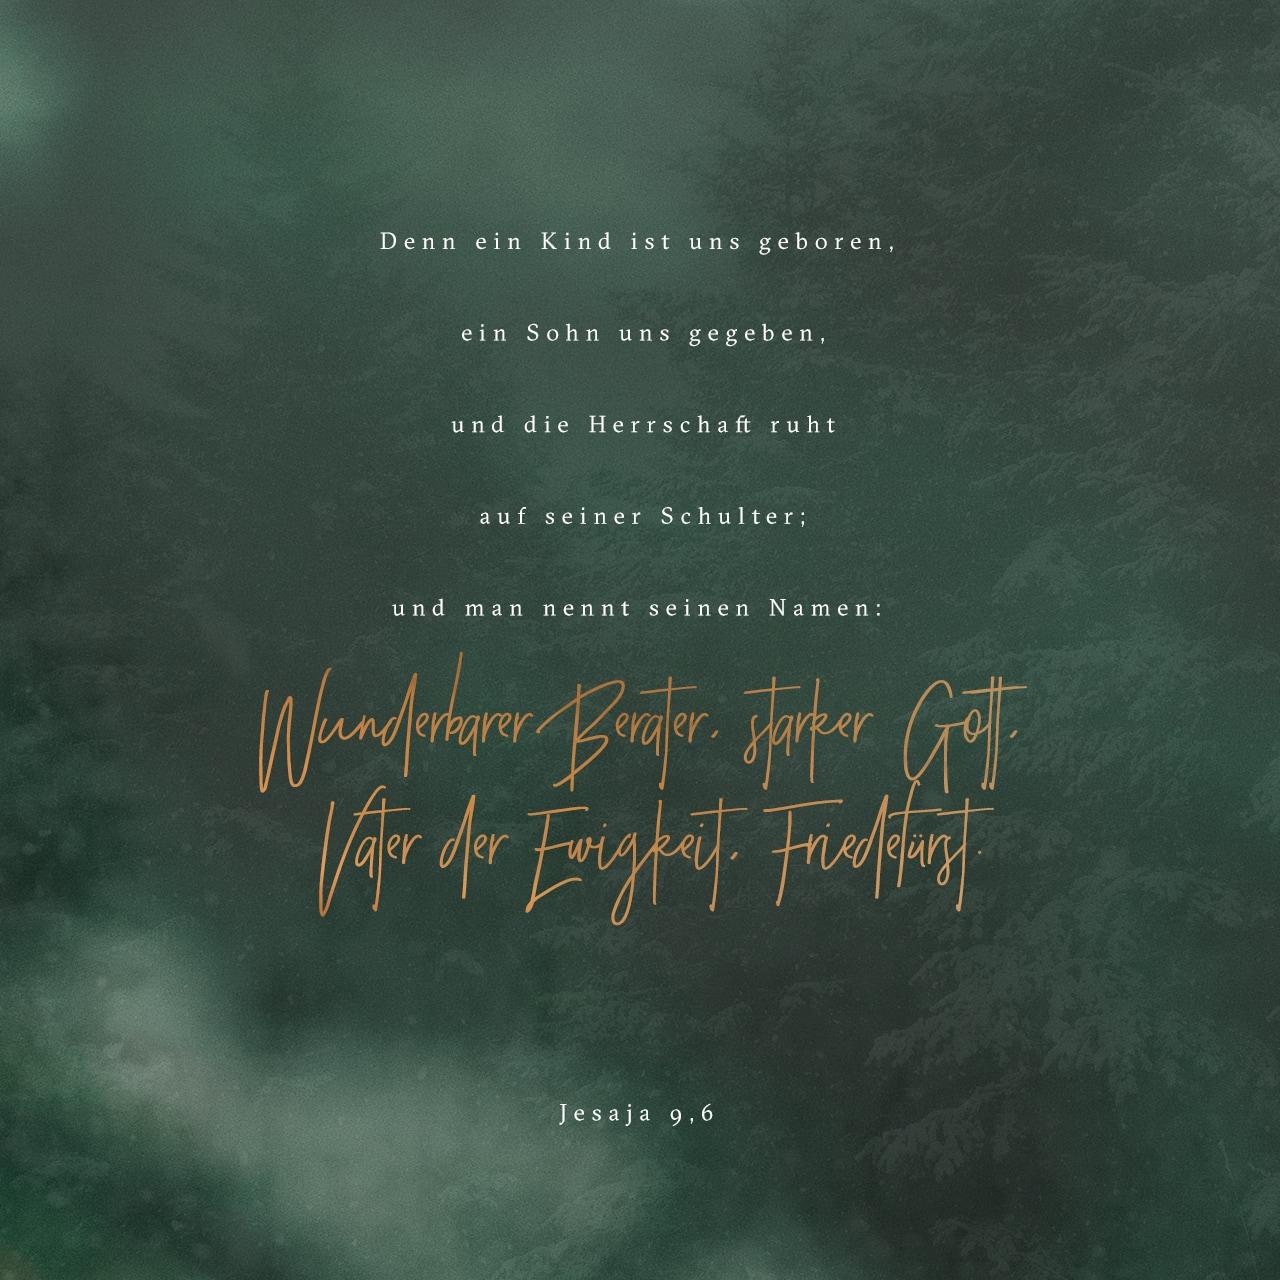 Versbild für Jesaja 9,6